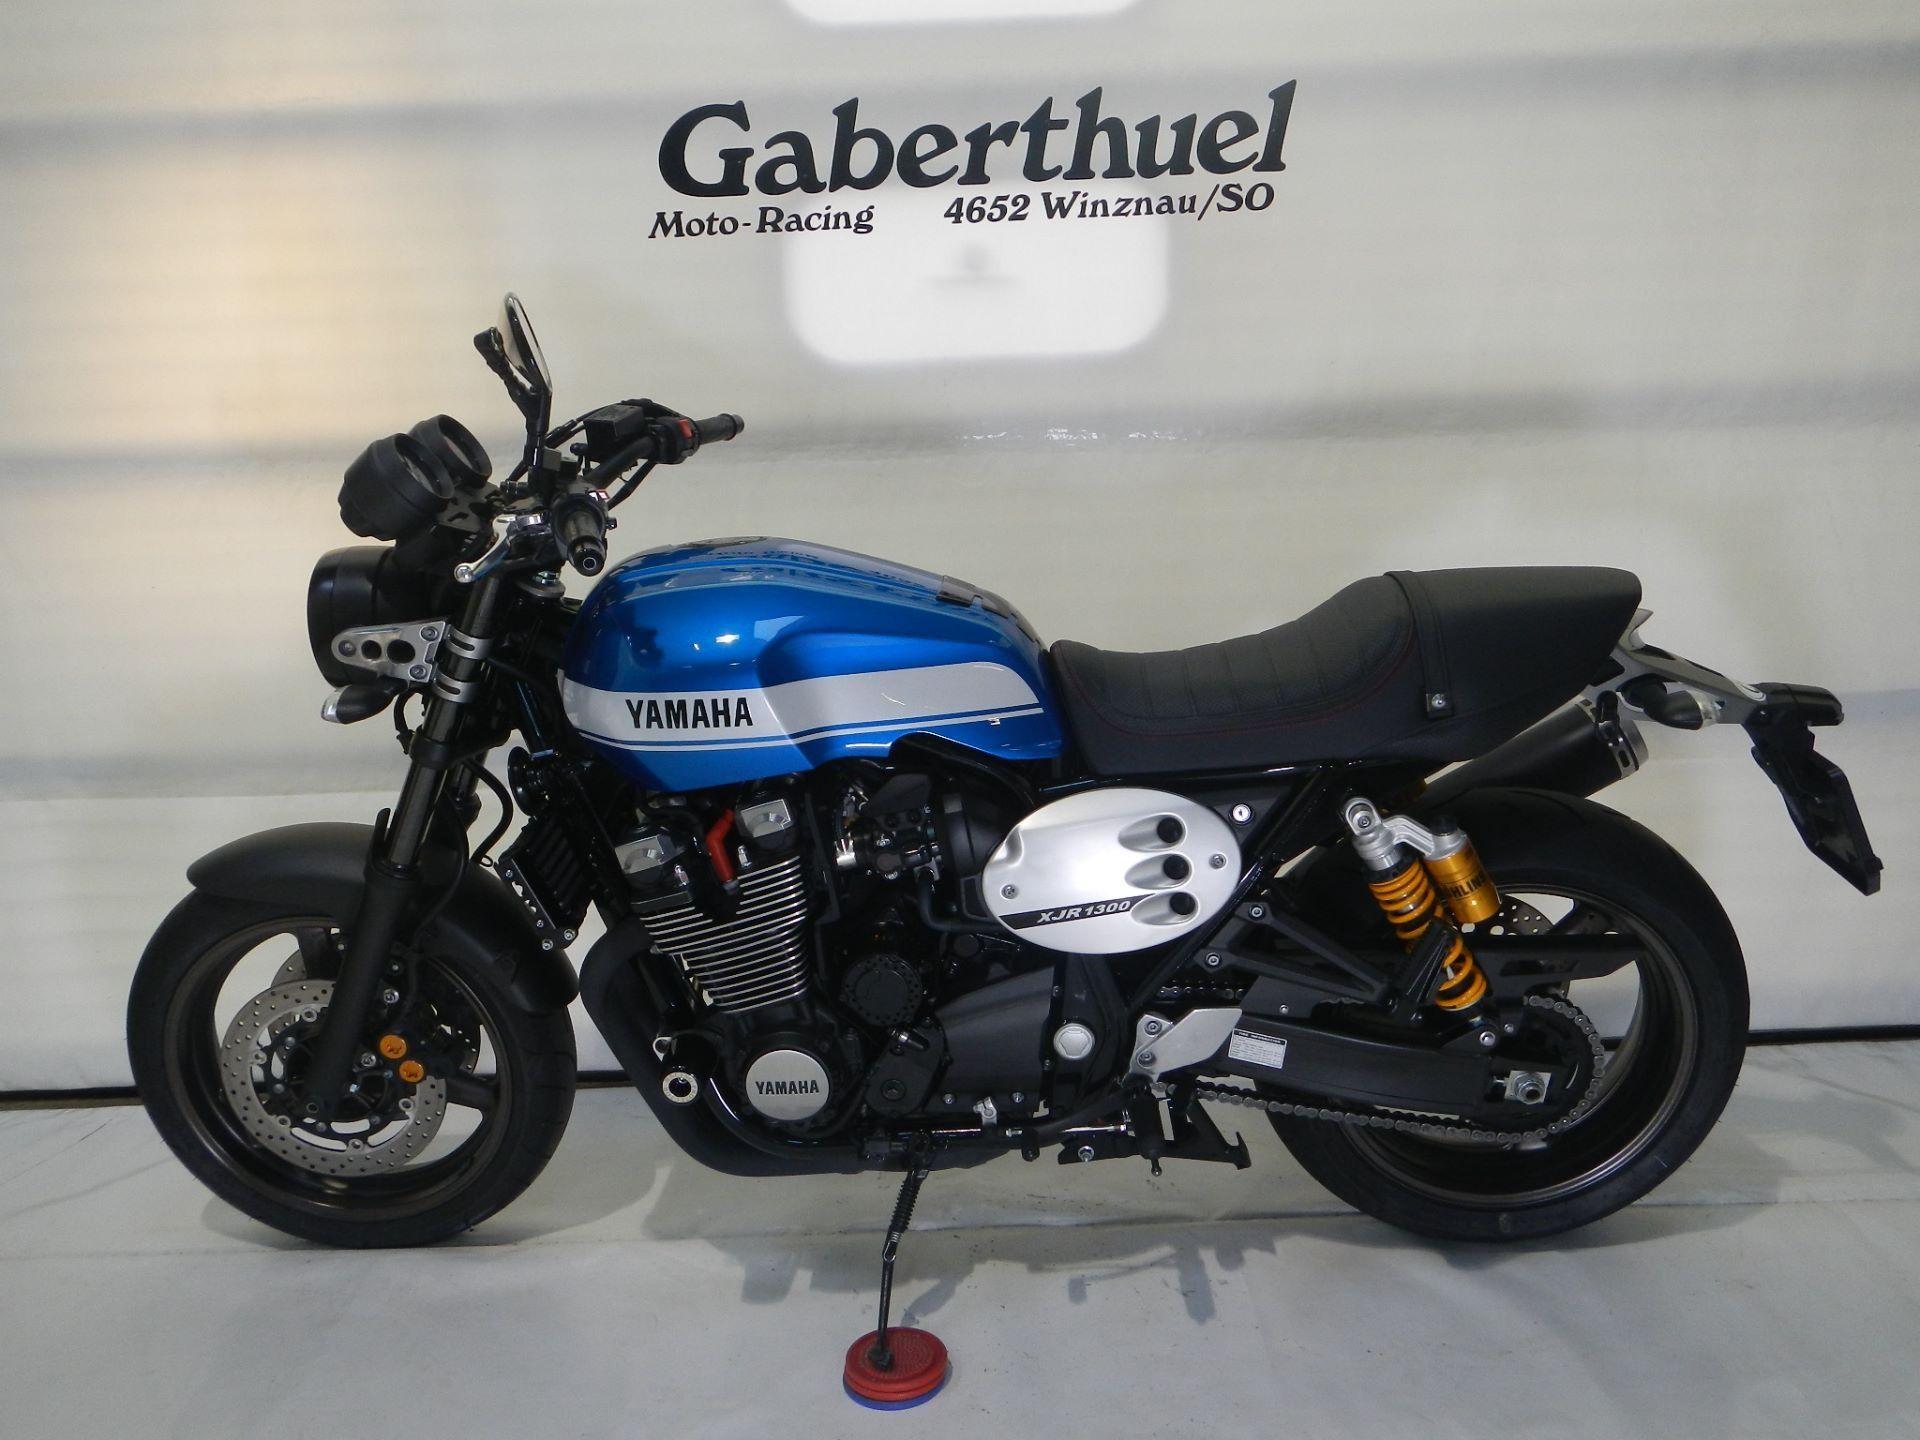 motorrad occasion kaufen yamaha xjr 1300 gaberth l moto. Black Bedroom Furniture Sets. Home Design Ideas